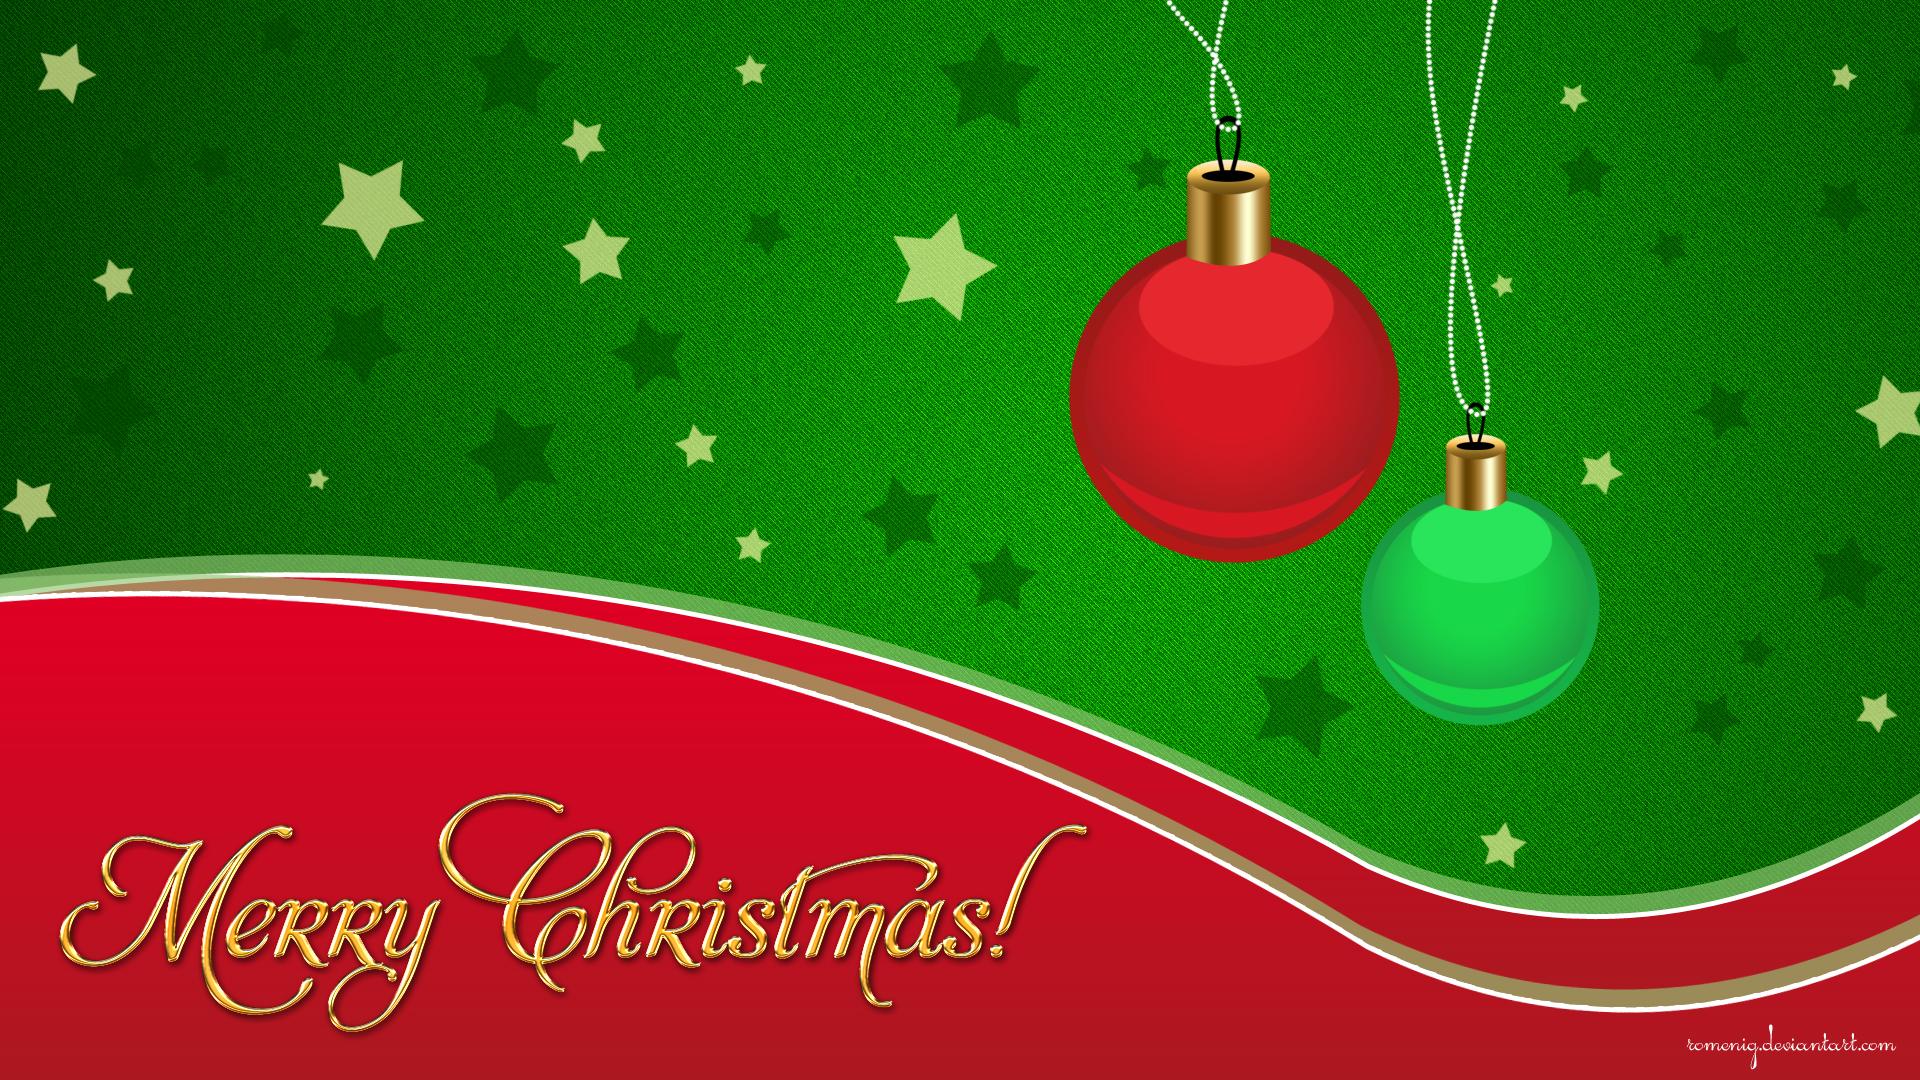 Merry Christmas Wallpaper By Romenig On Deviantart